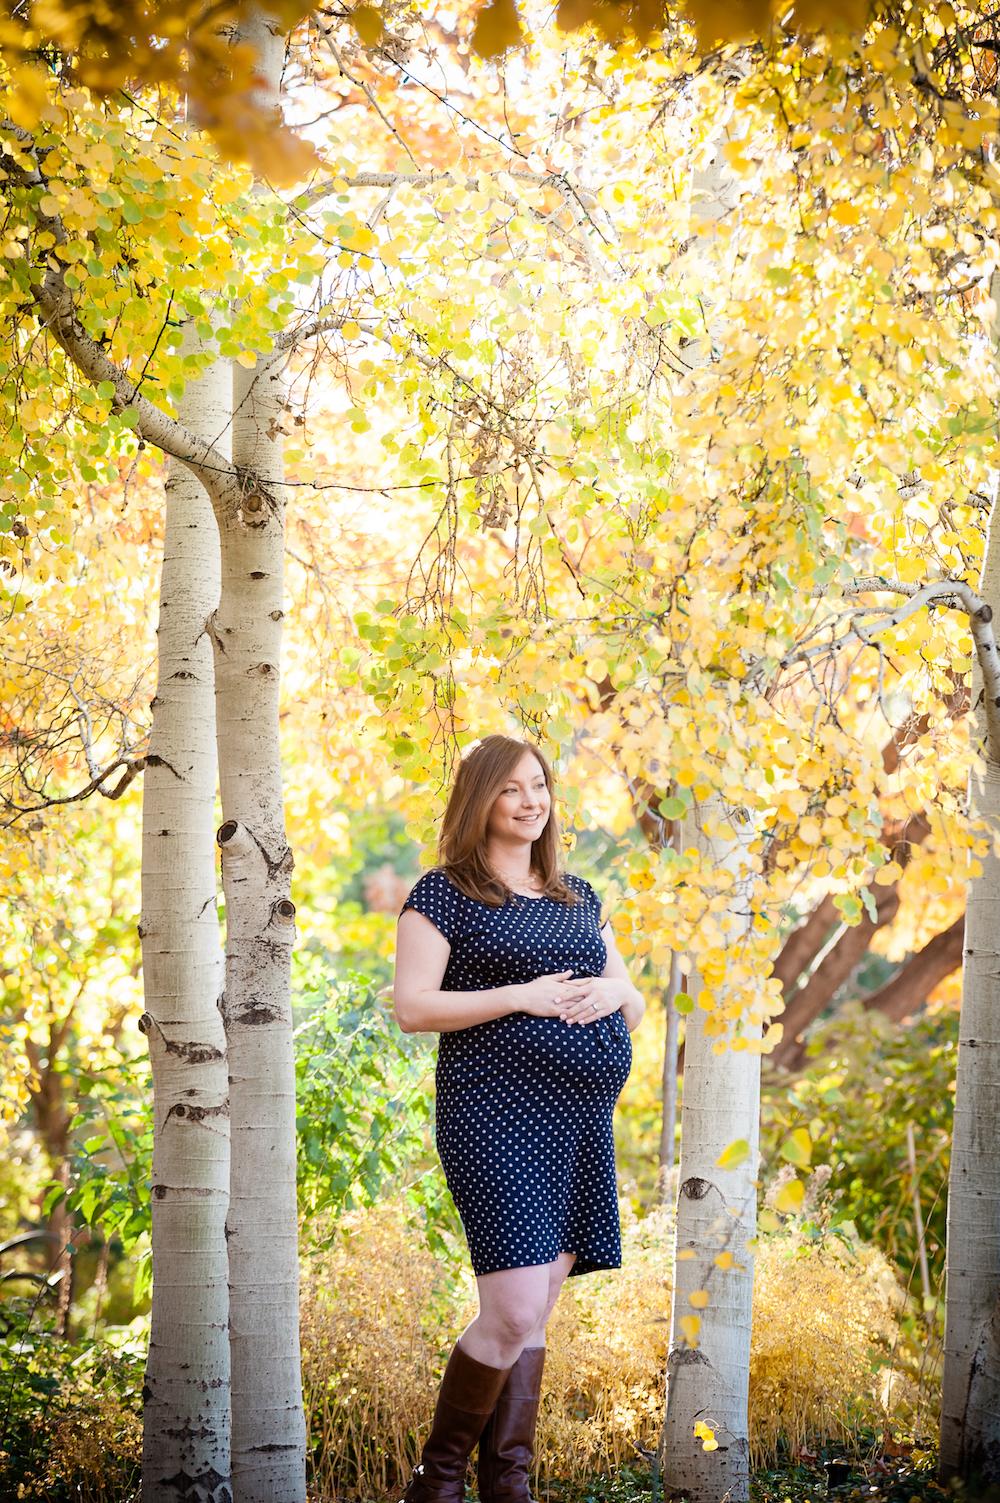 ck-Colorado-Maternity-Baby-Photography-0007.jpg